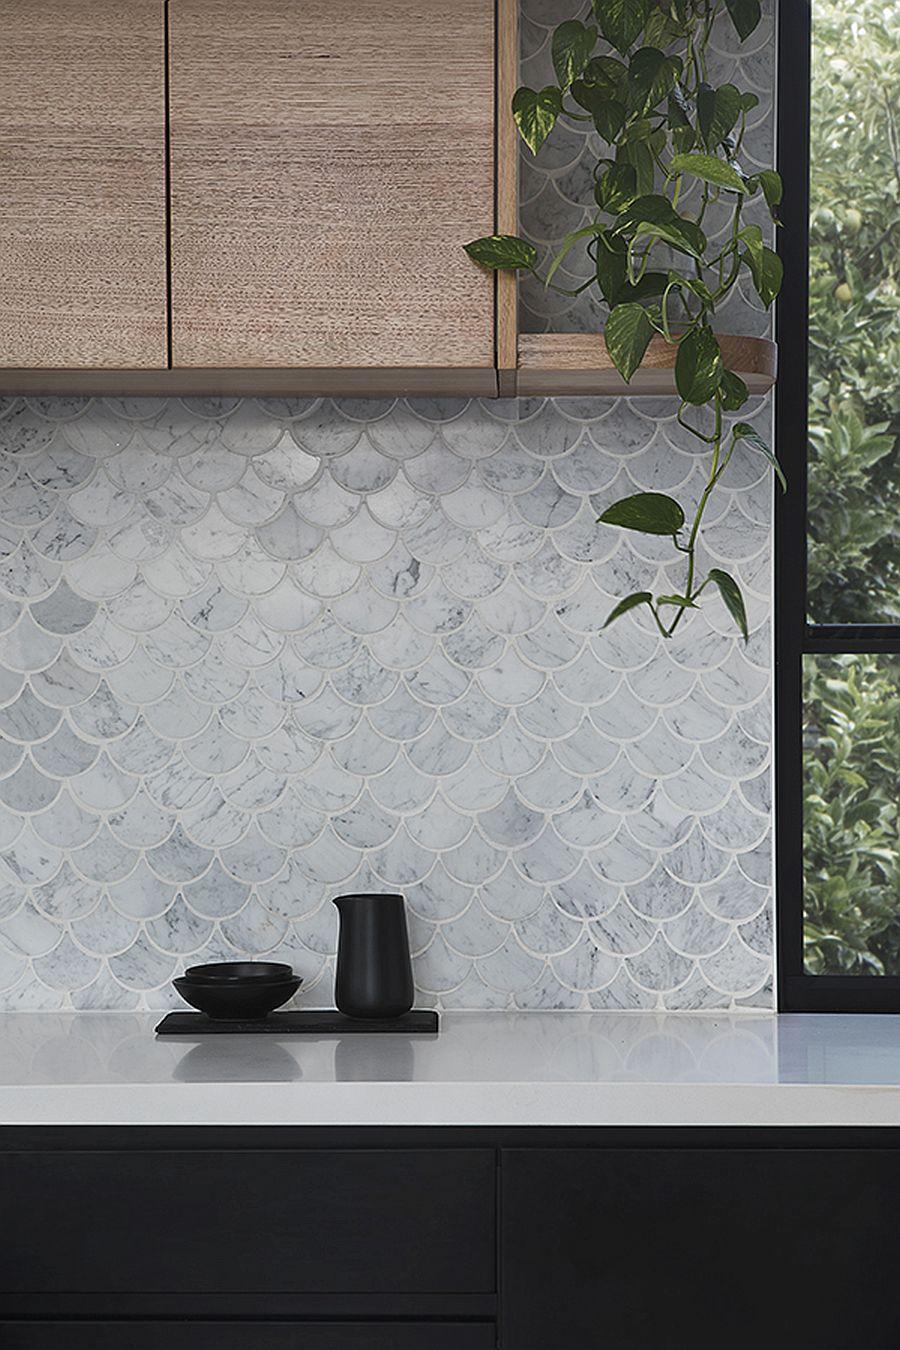 Unique-modern-backsplash-for-the-stylish-kitchen